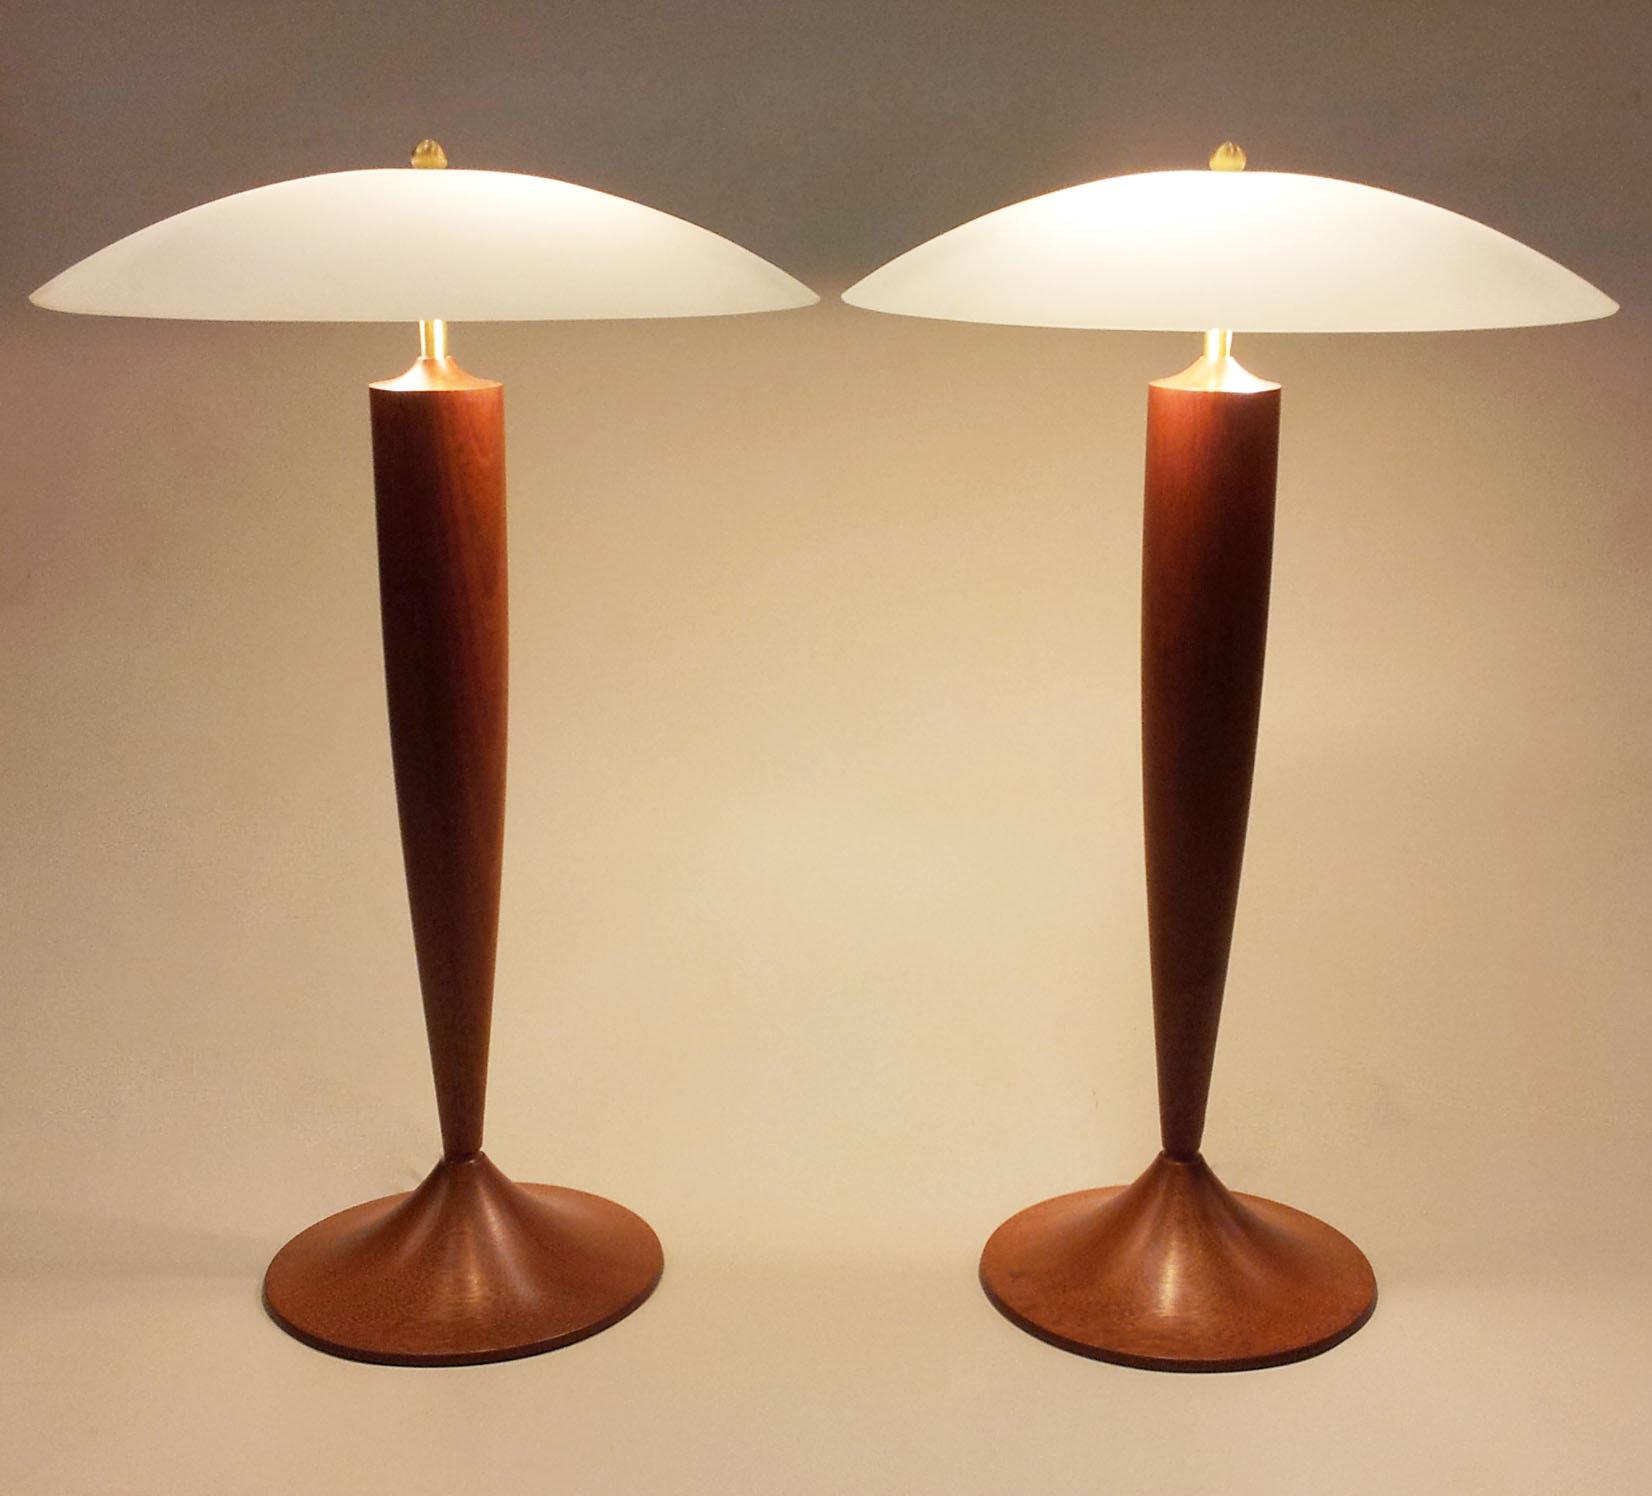 TOP 10 Modern bedside table lamps 2020 | Warisan Lighting